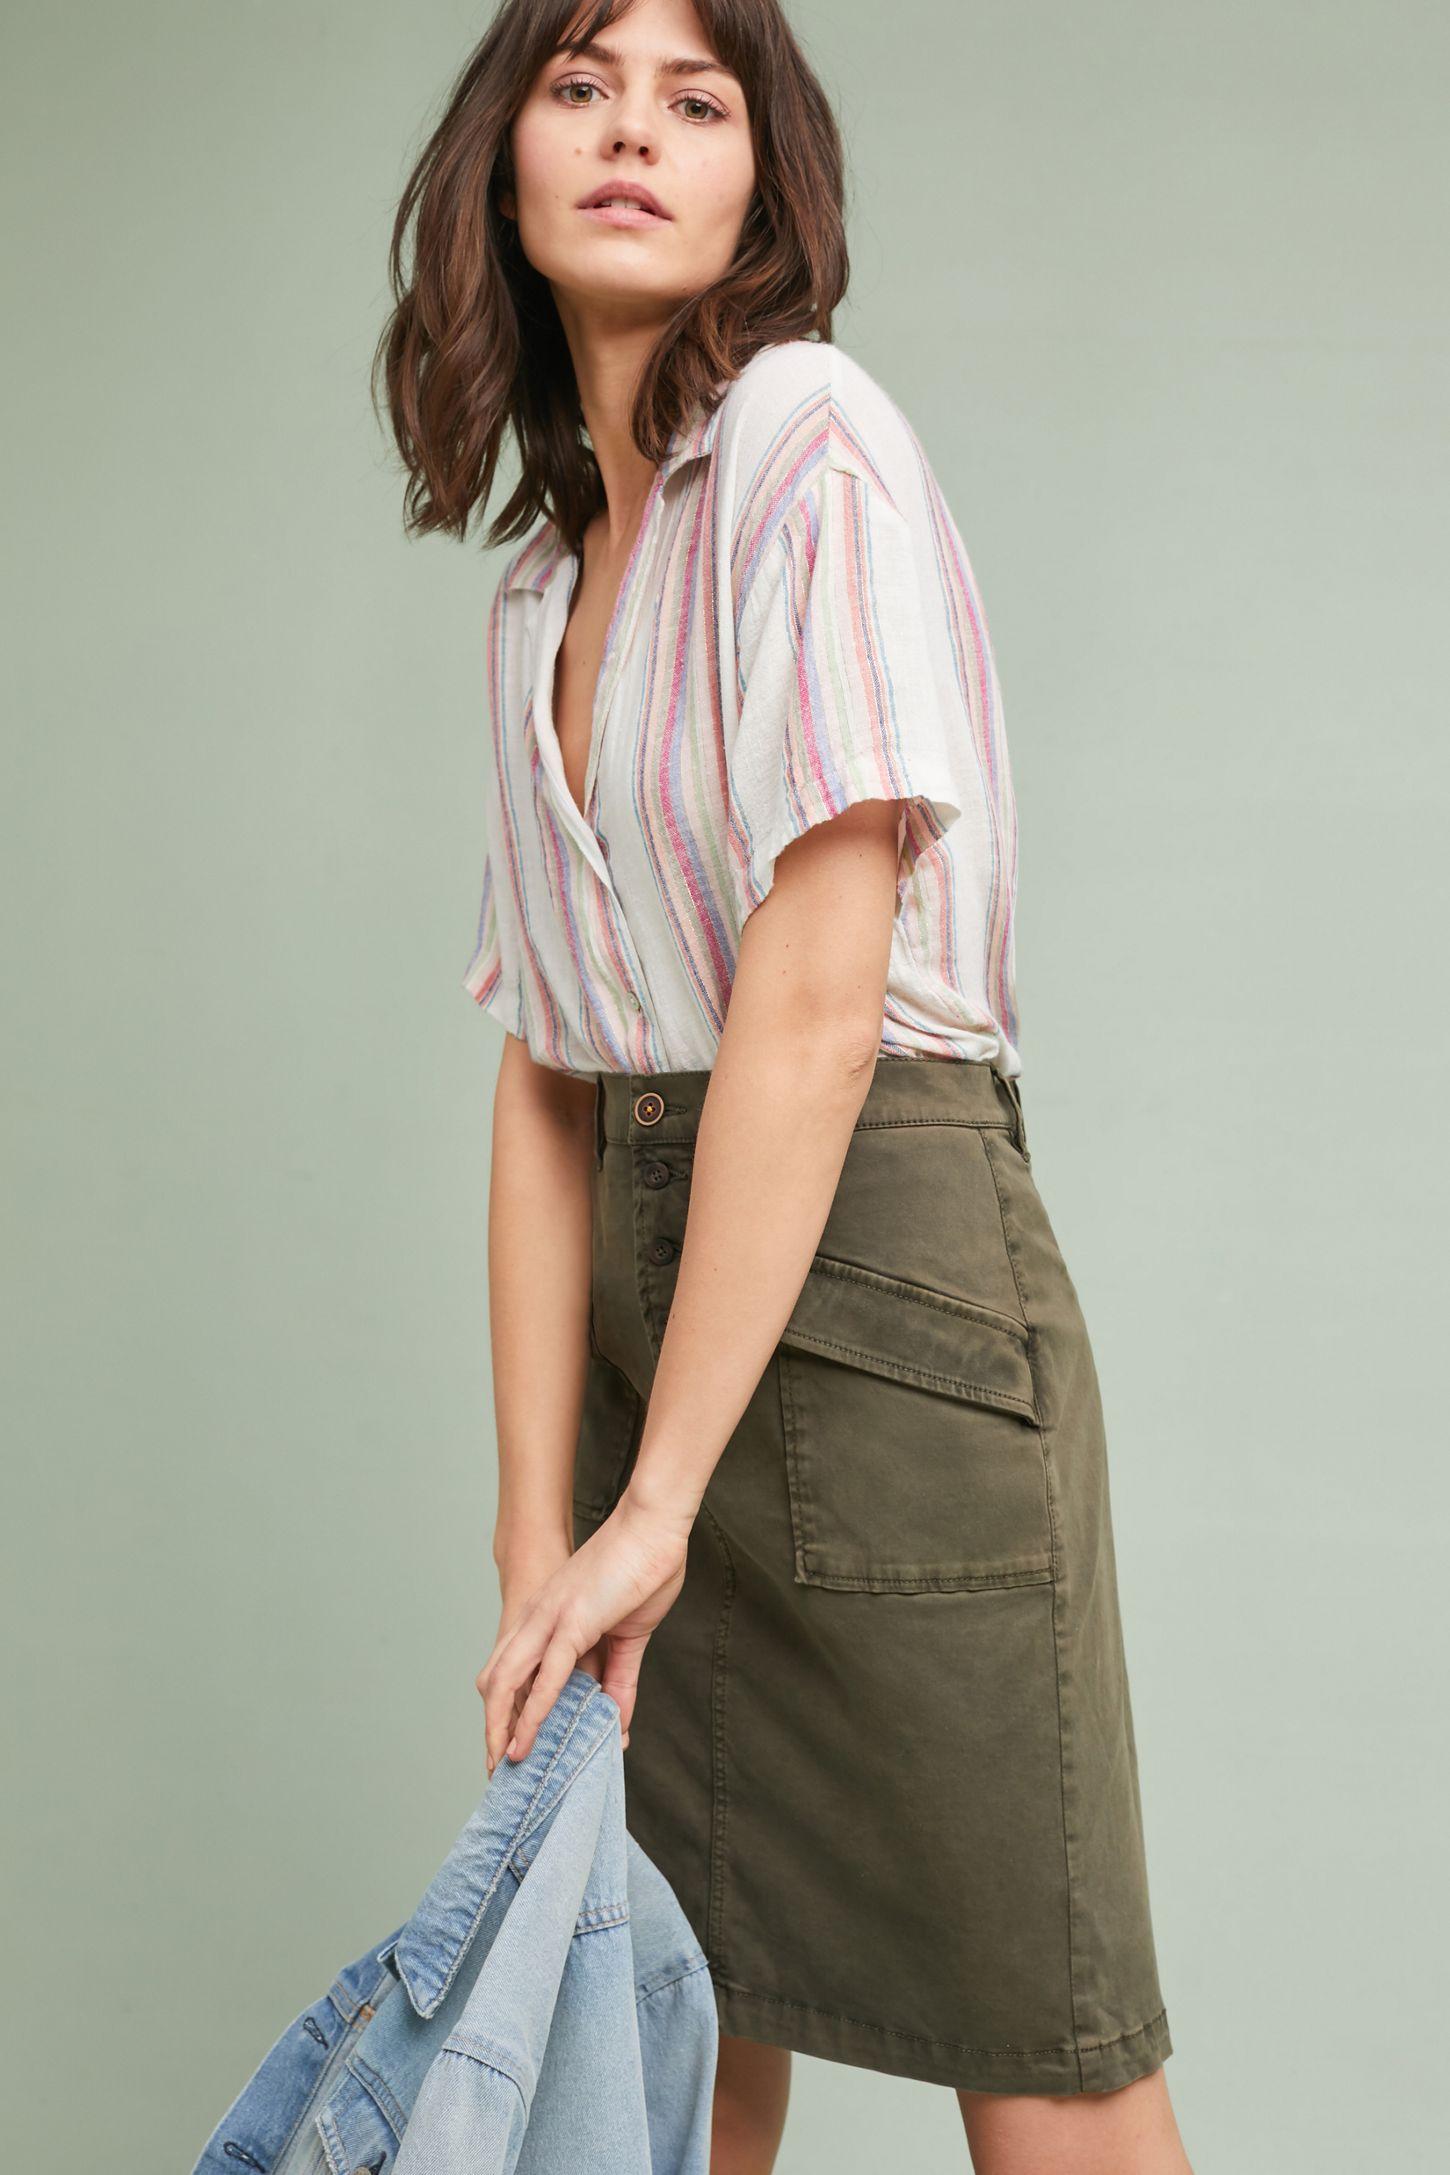 8f4783f45f1b9 Pilcro Chino Pencil Skirt